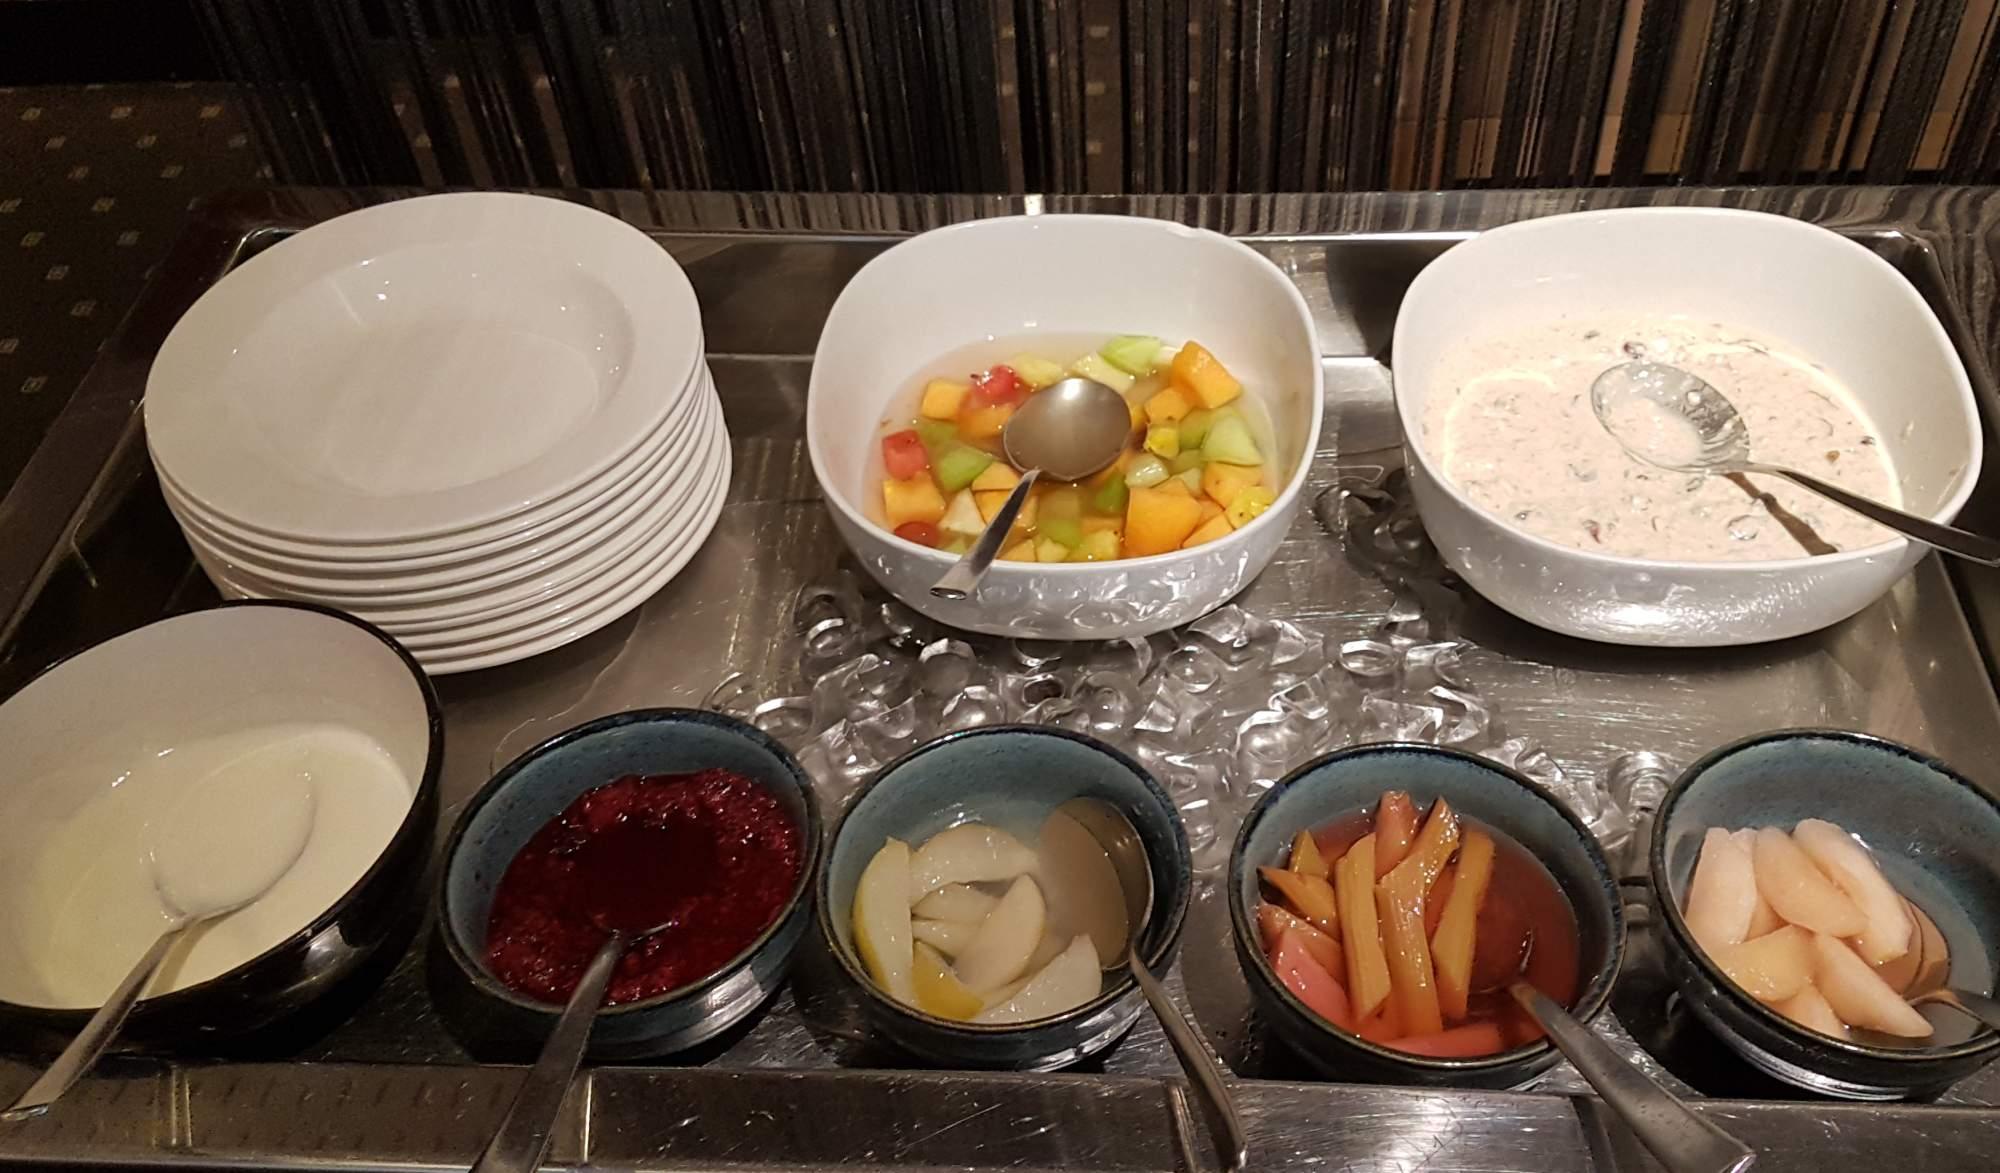 Artisan - bircher stewed fruit bar